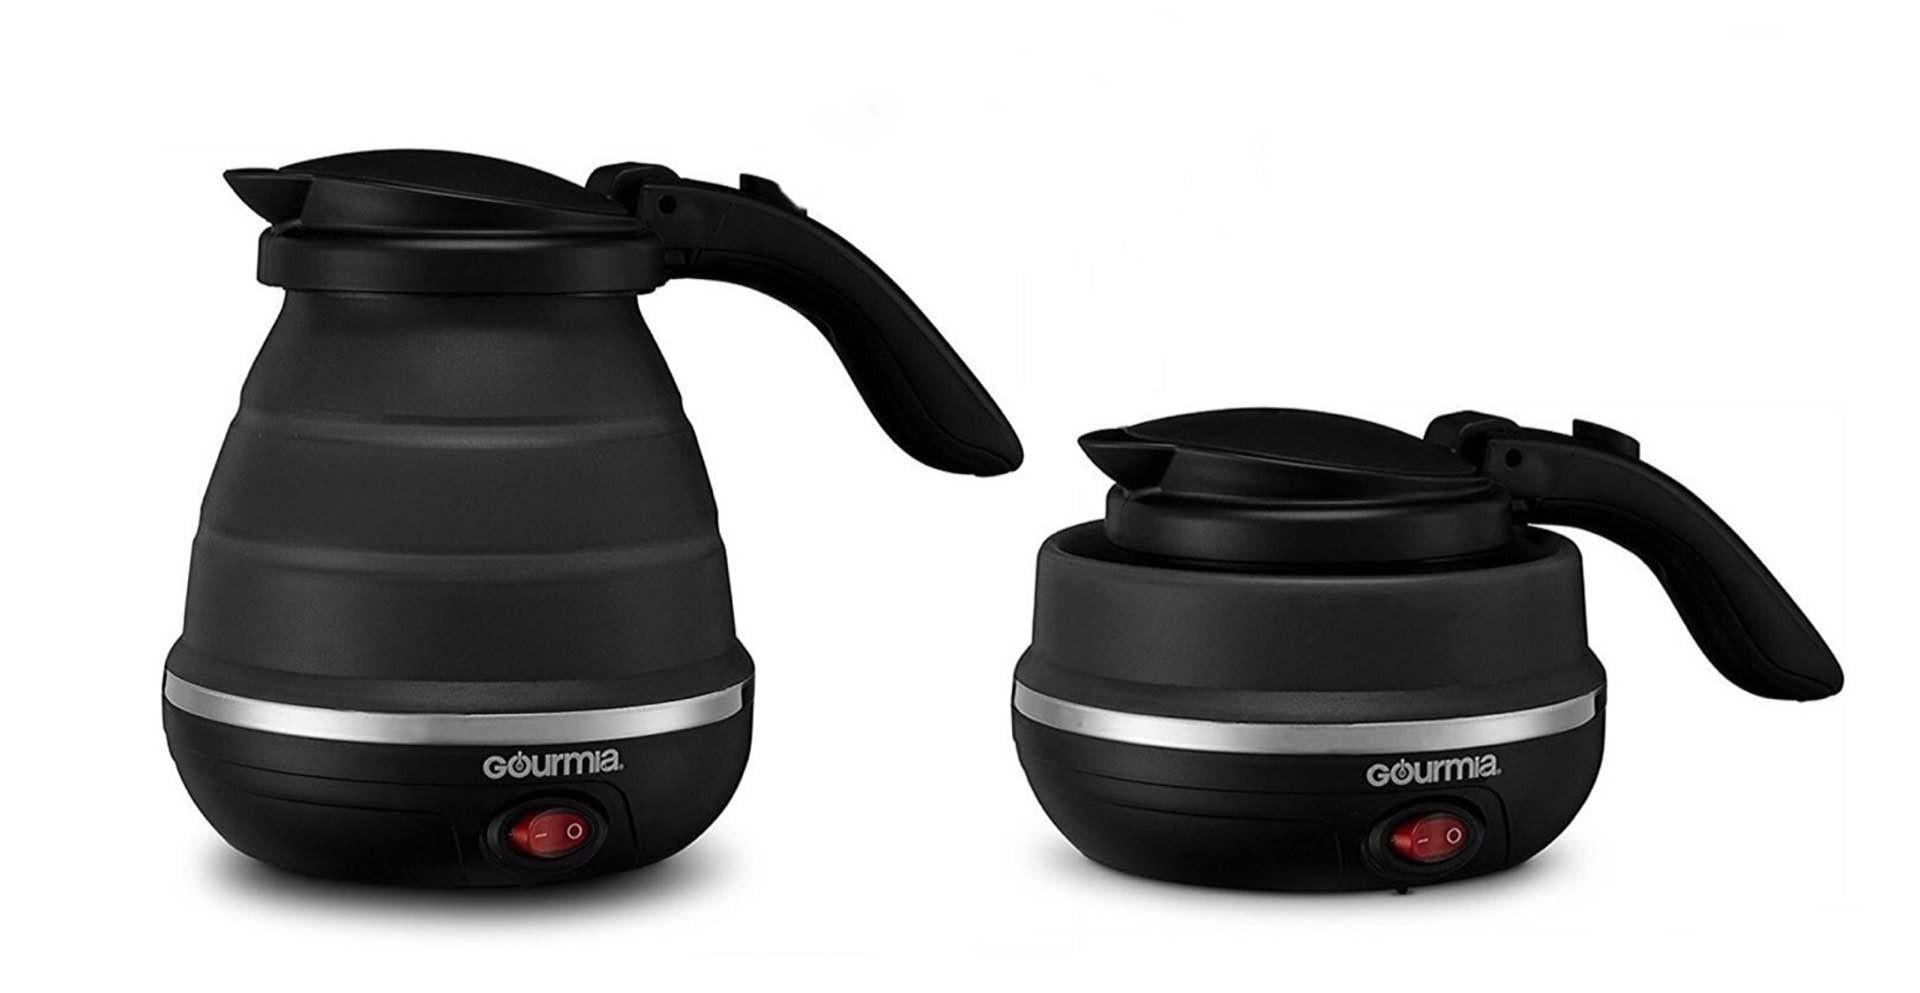 Gourmia foldable travel electric kettle. ($30)